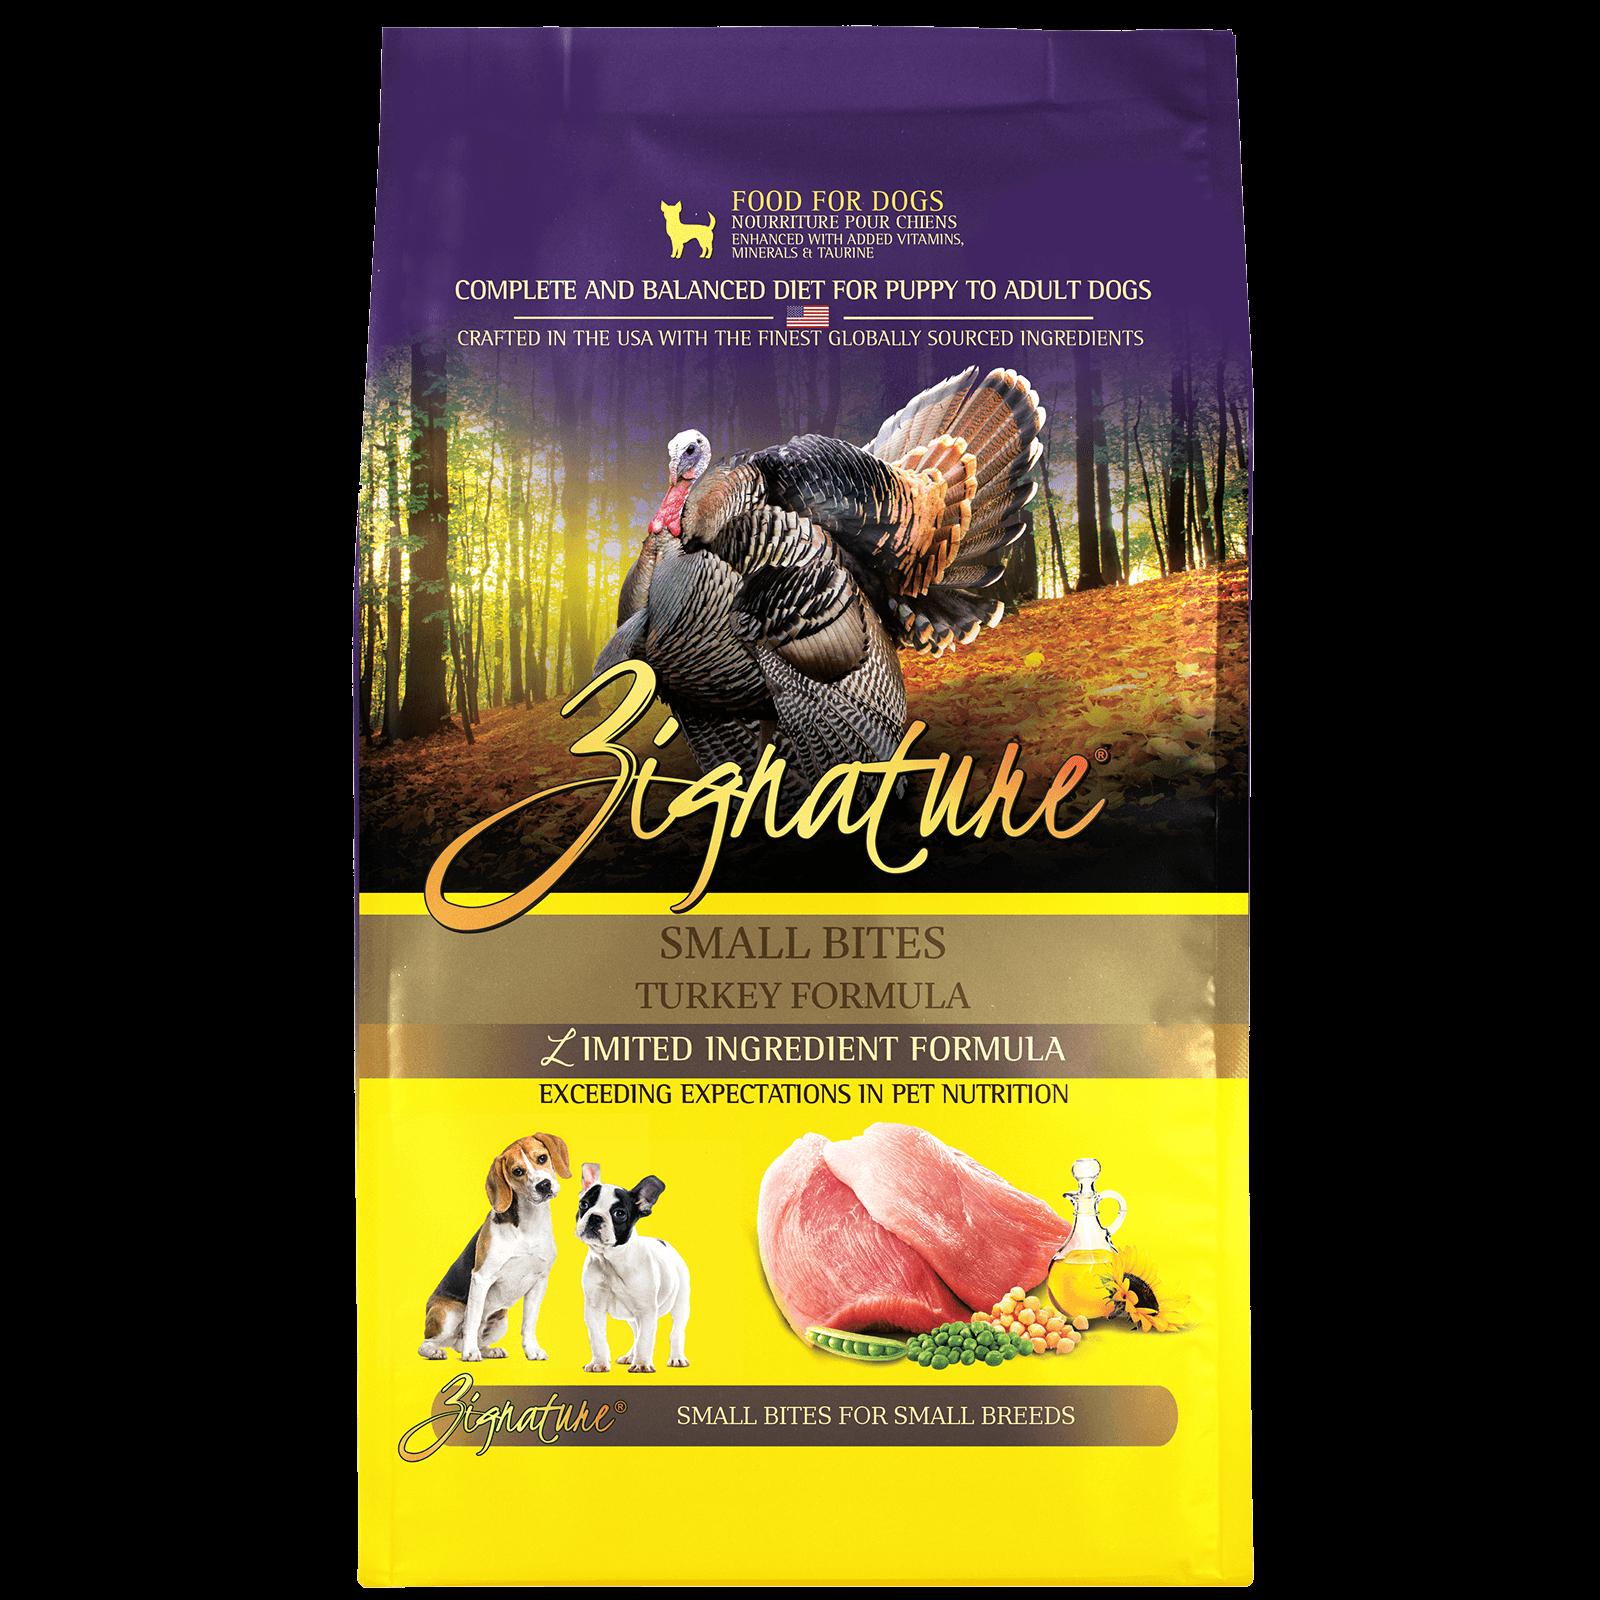 Zignature Turkey Formula Small Bites Dry Dog Food